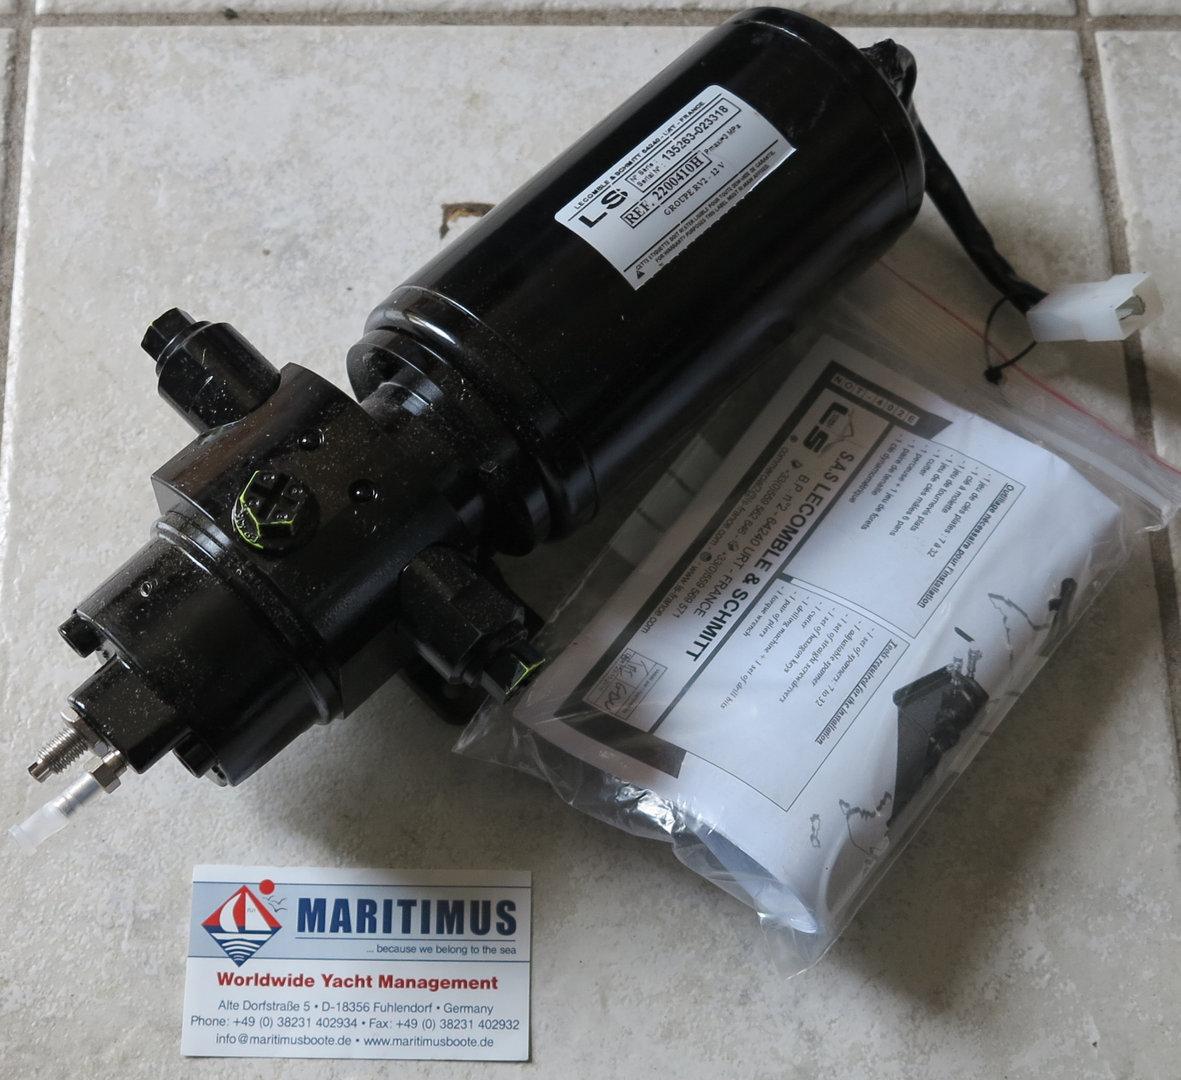 Pump RV2 Lecomble & Schmitt for hydraulic steering system